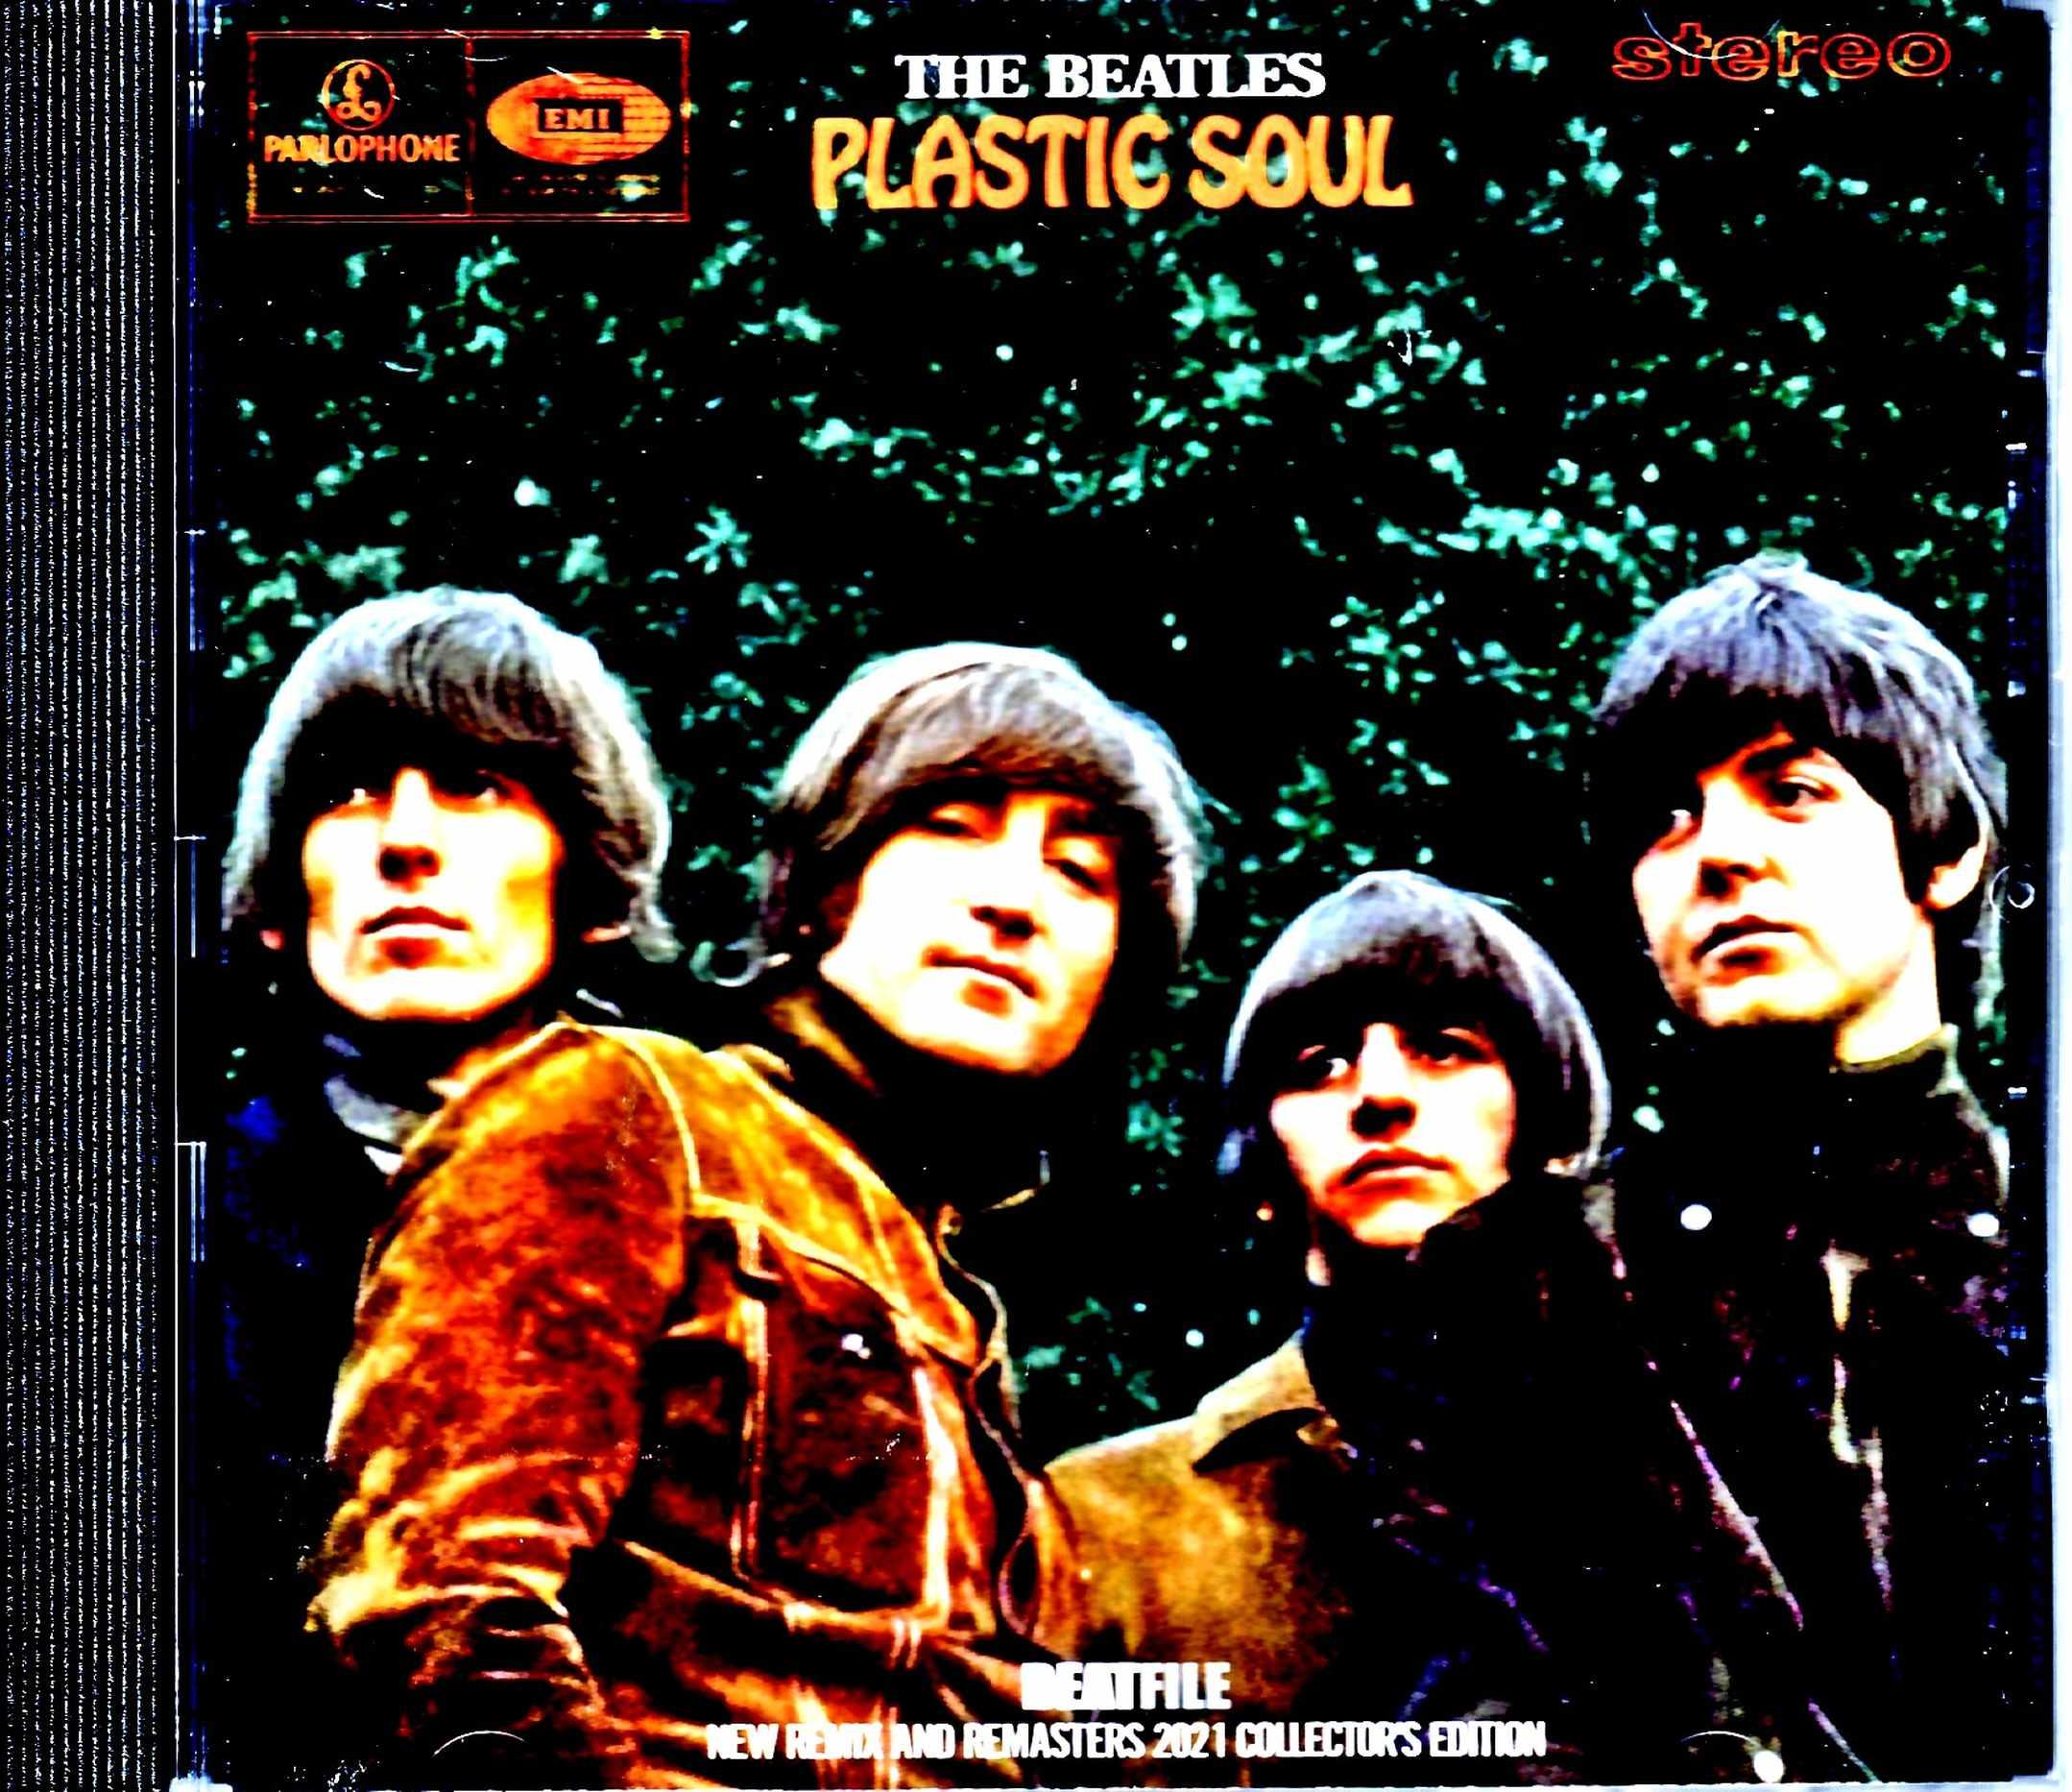 Beatles ビートルズ/ラバー・ソウル Rubber Soul Alternate Cpmpilation